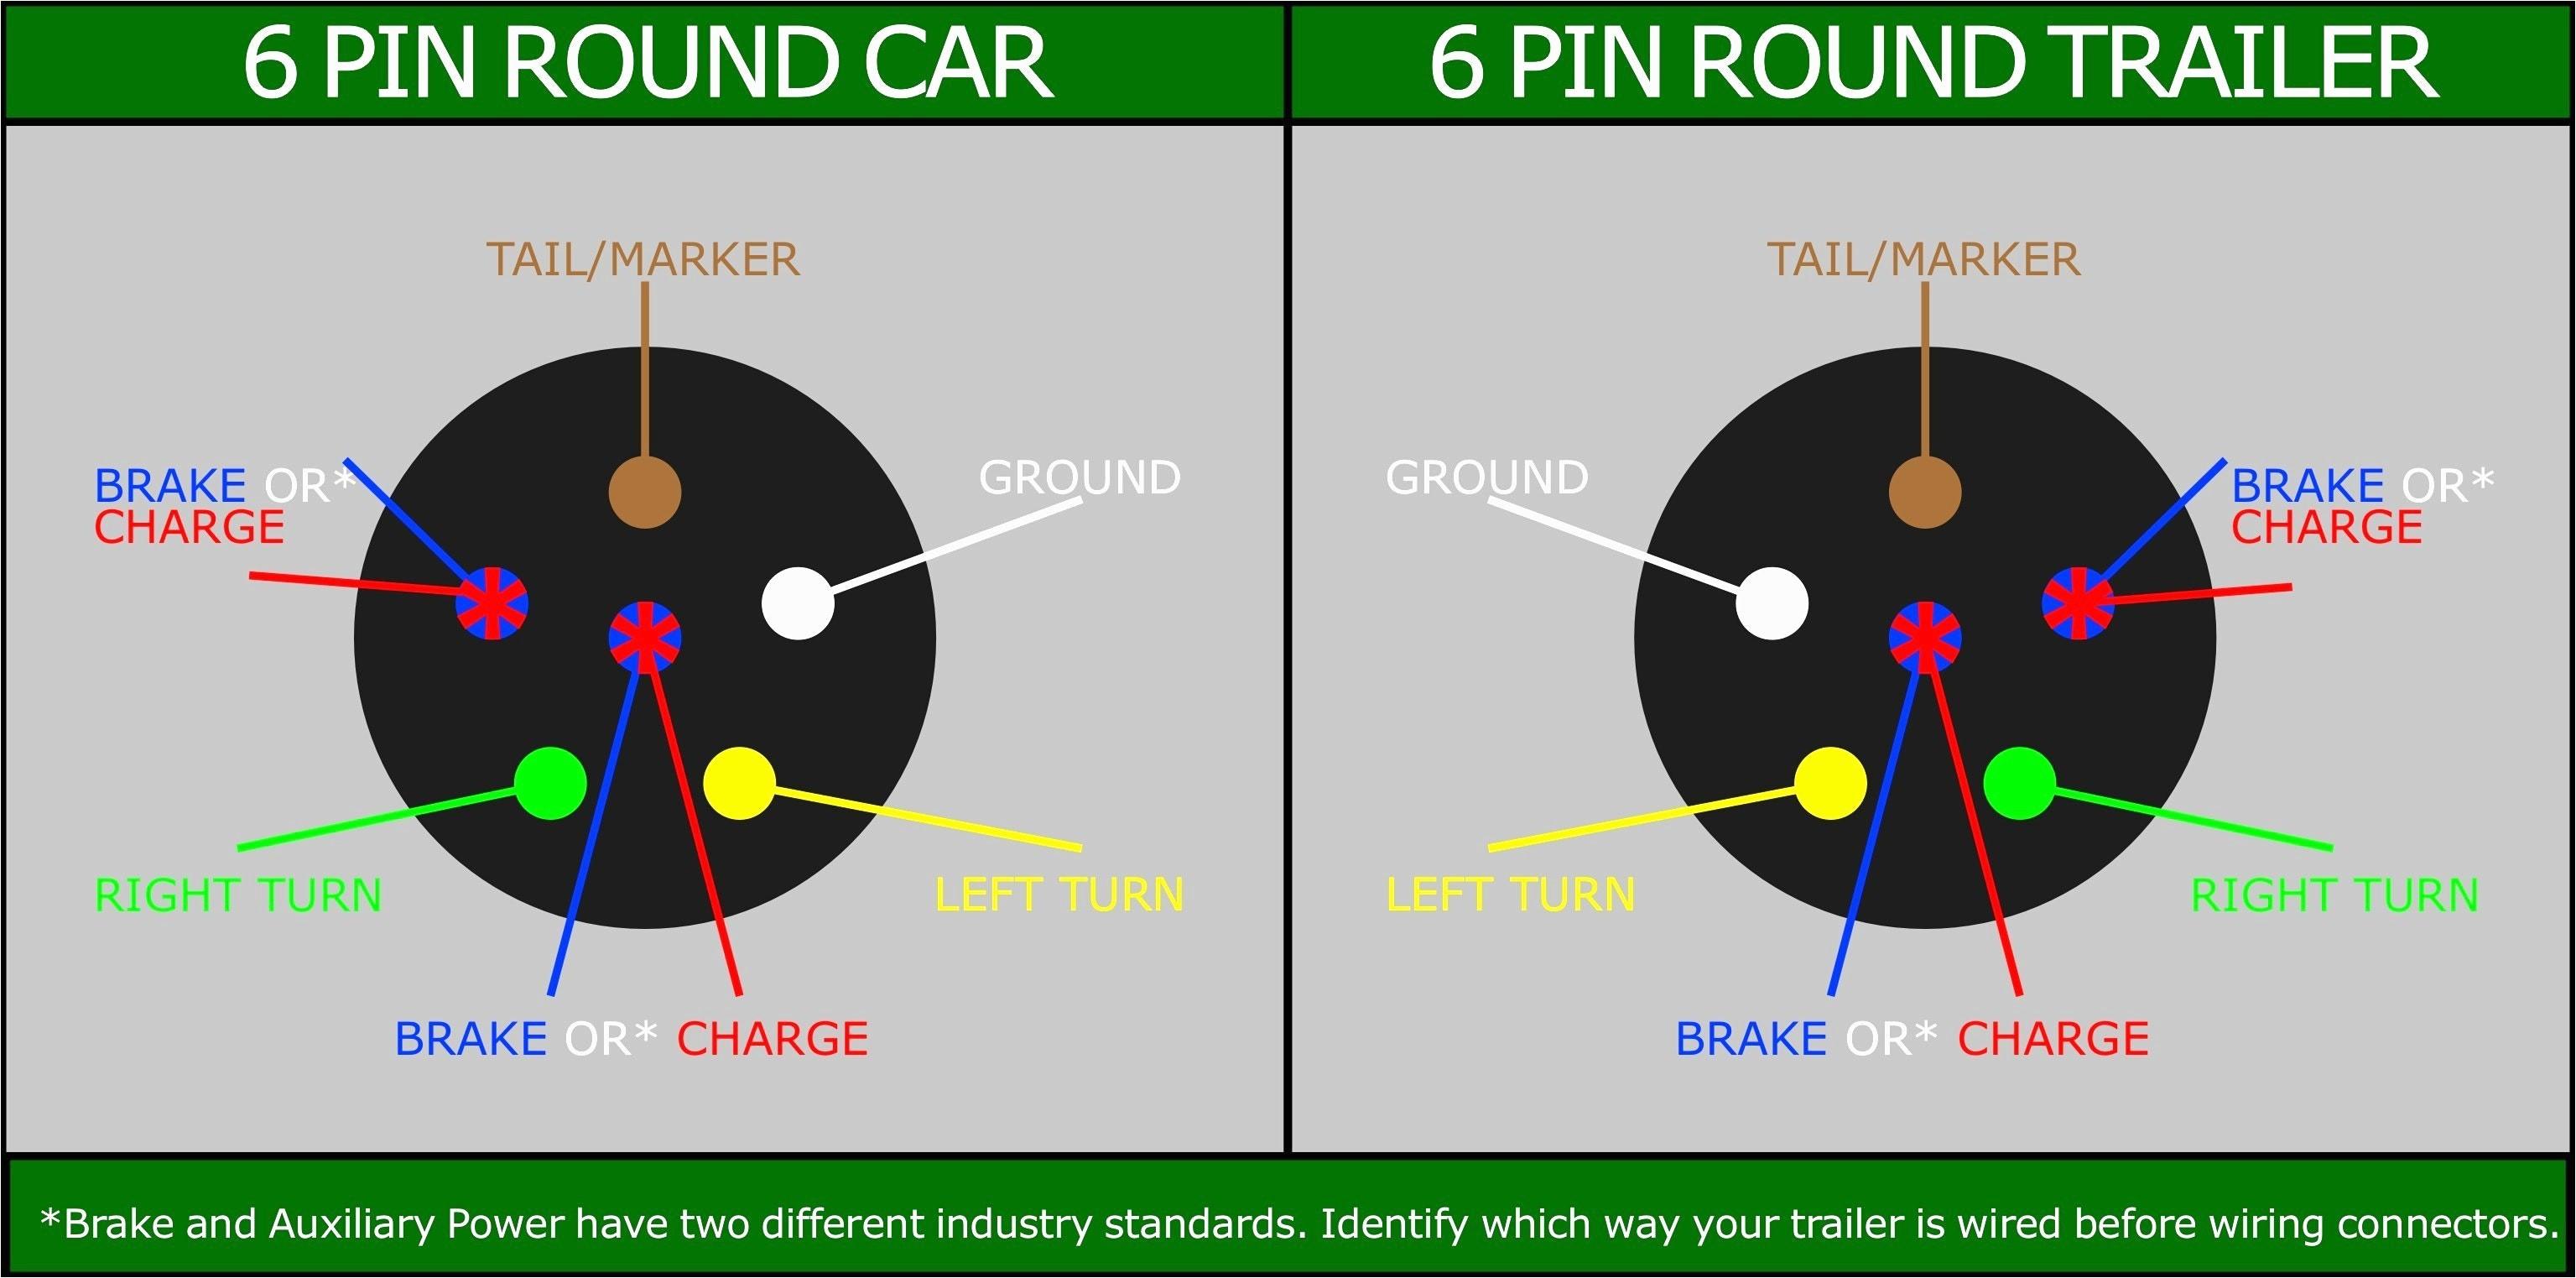 how to wire a 6 pole round trailer end plug etrailercom new wiring 6 pole trailer wiring diagram 6 pole wire diagram